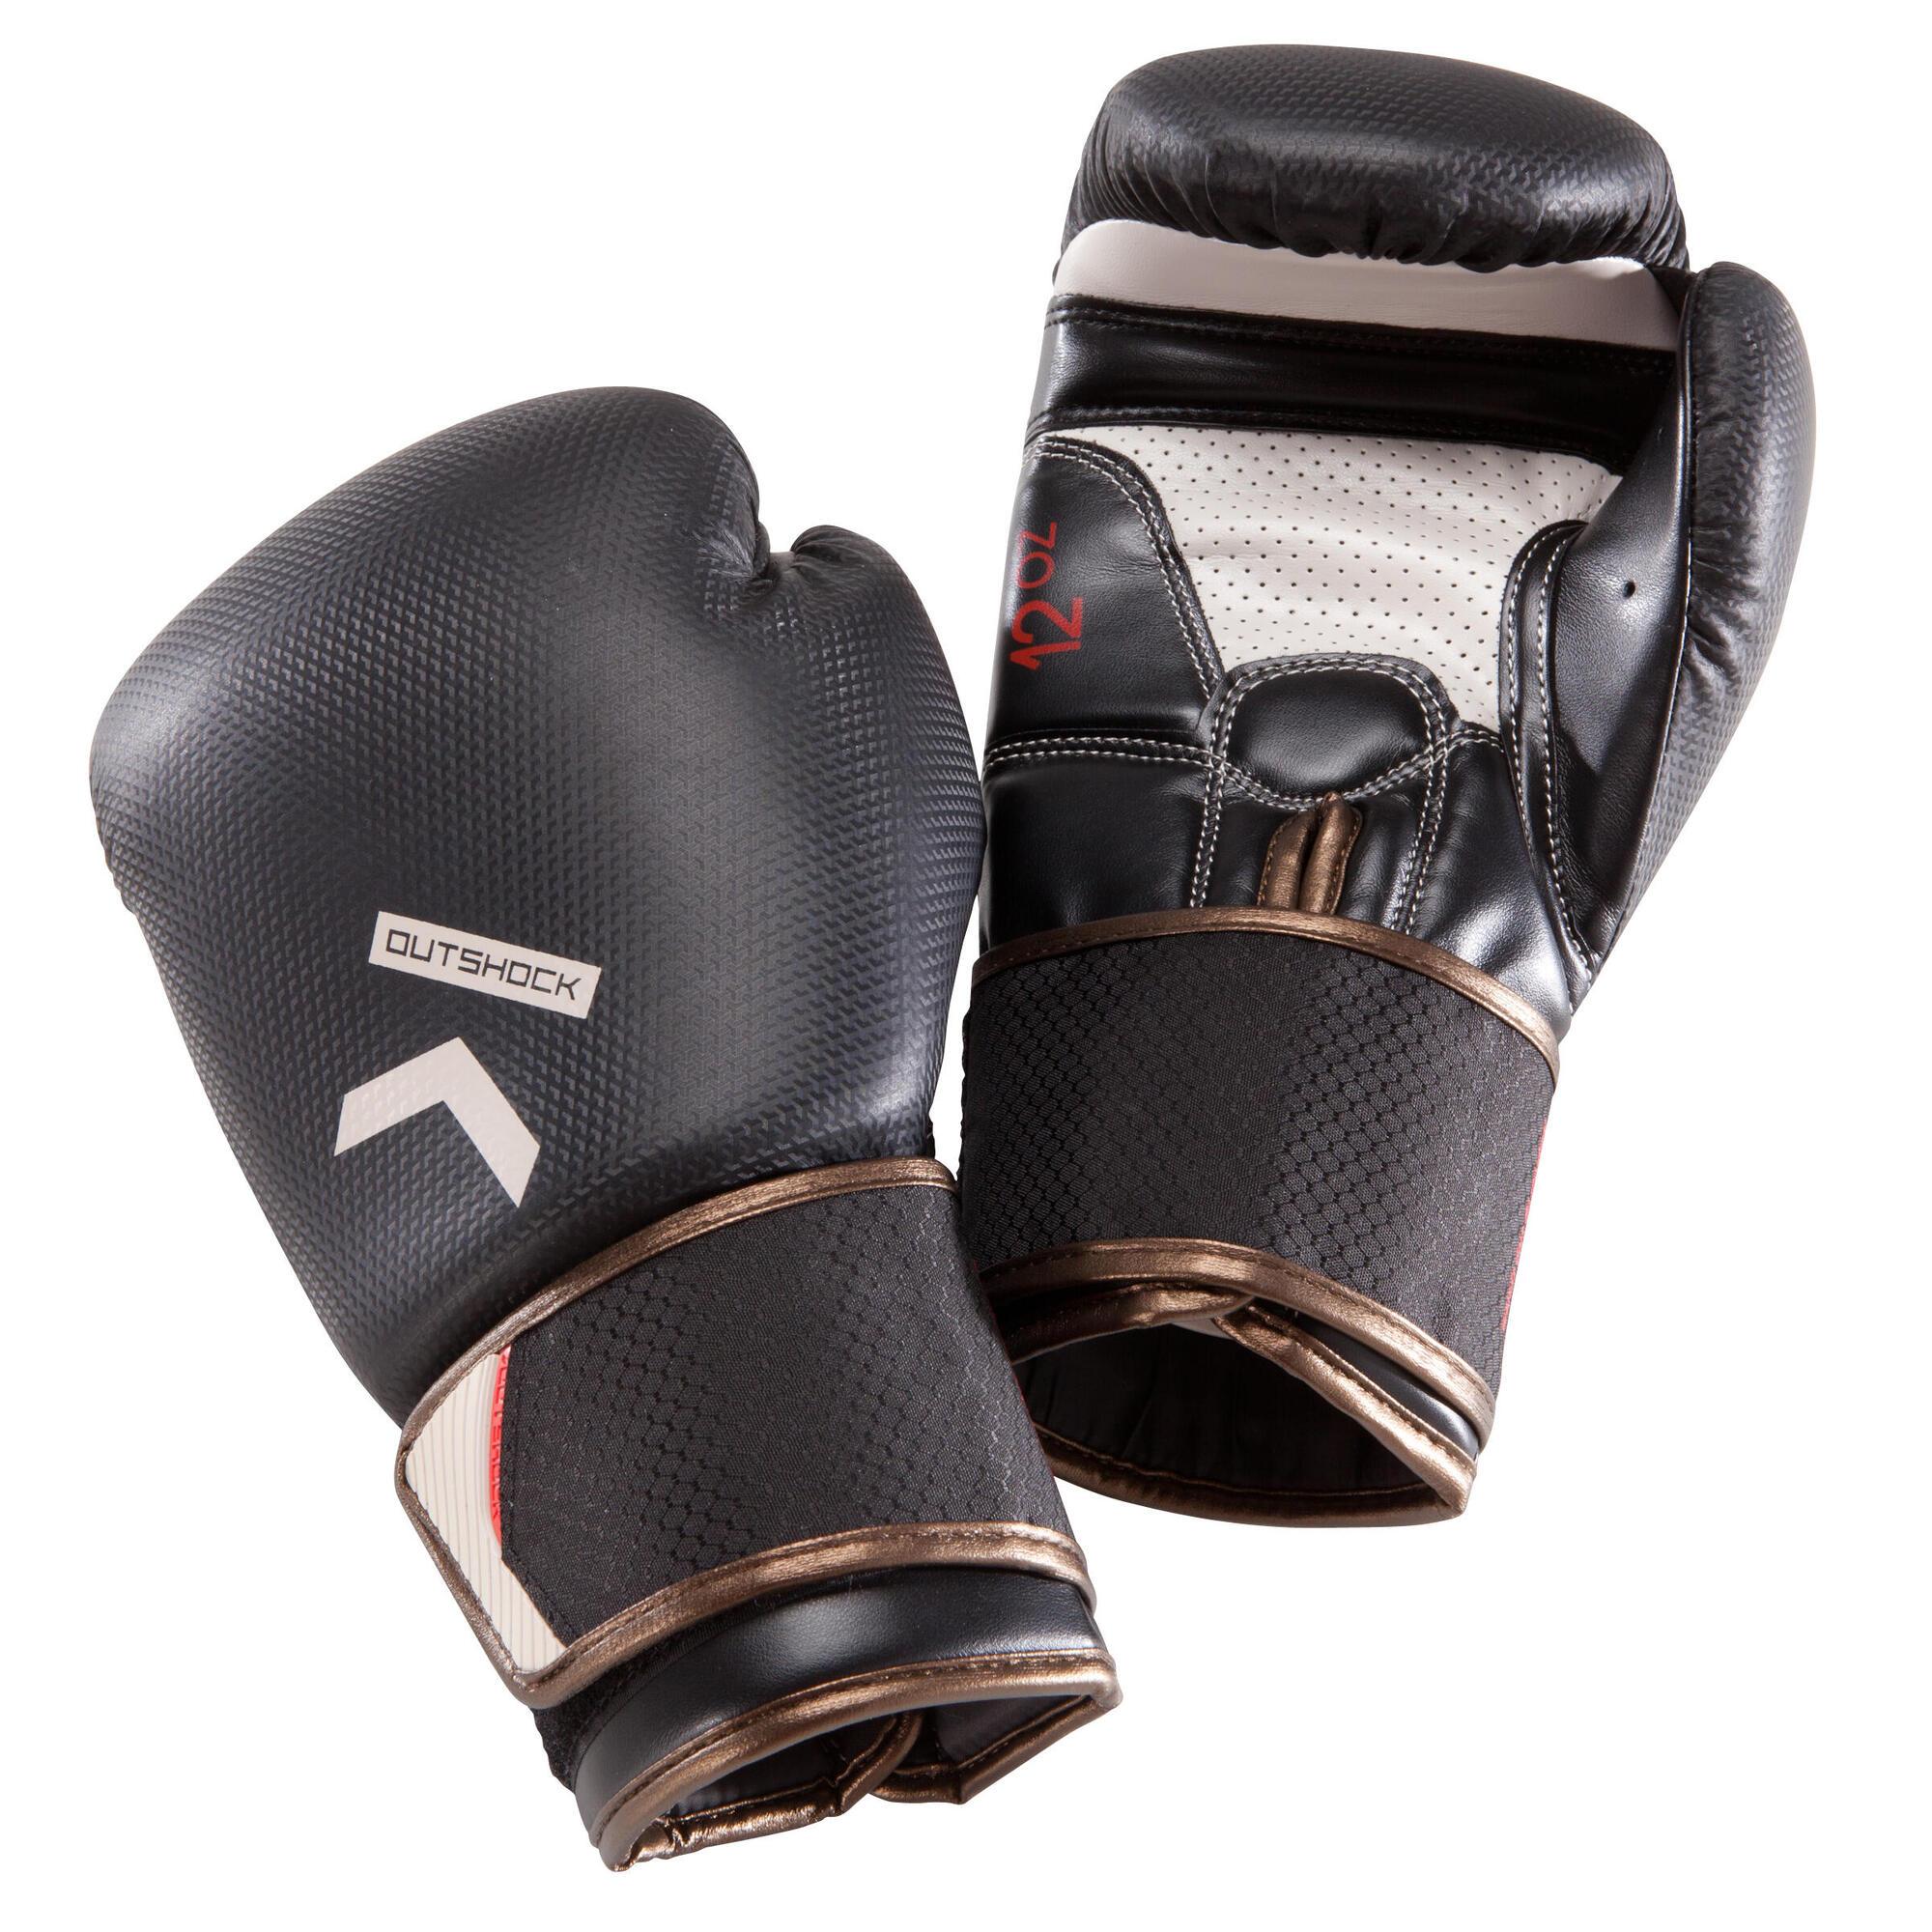 фото боксерских рукавичек моем комментарии слово